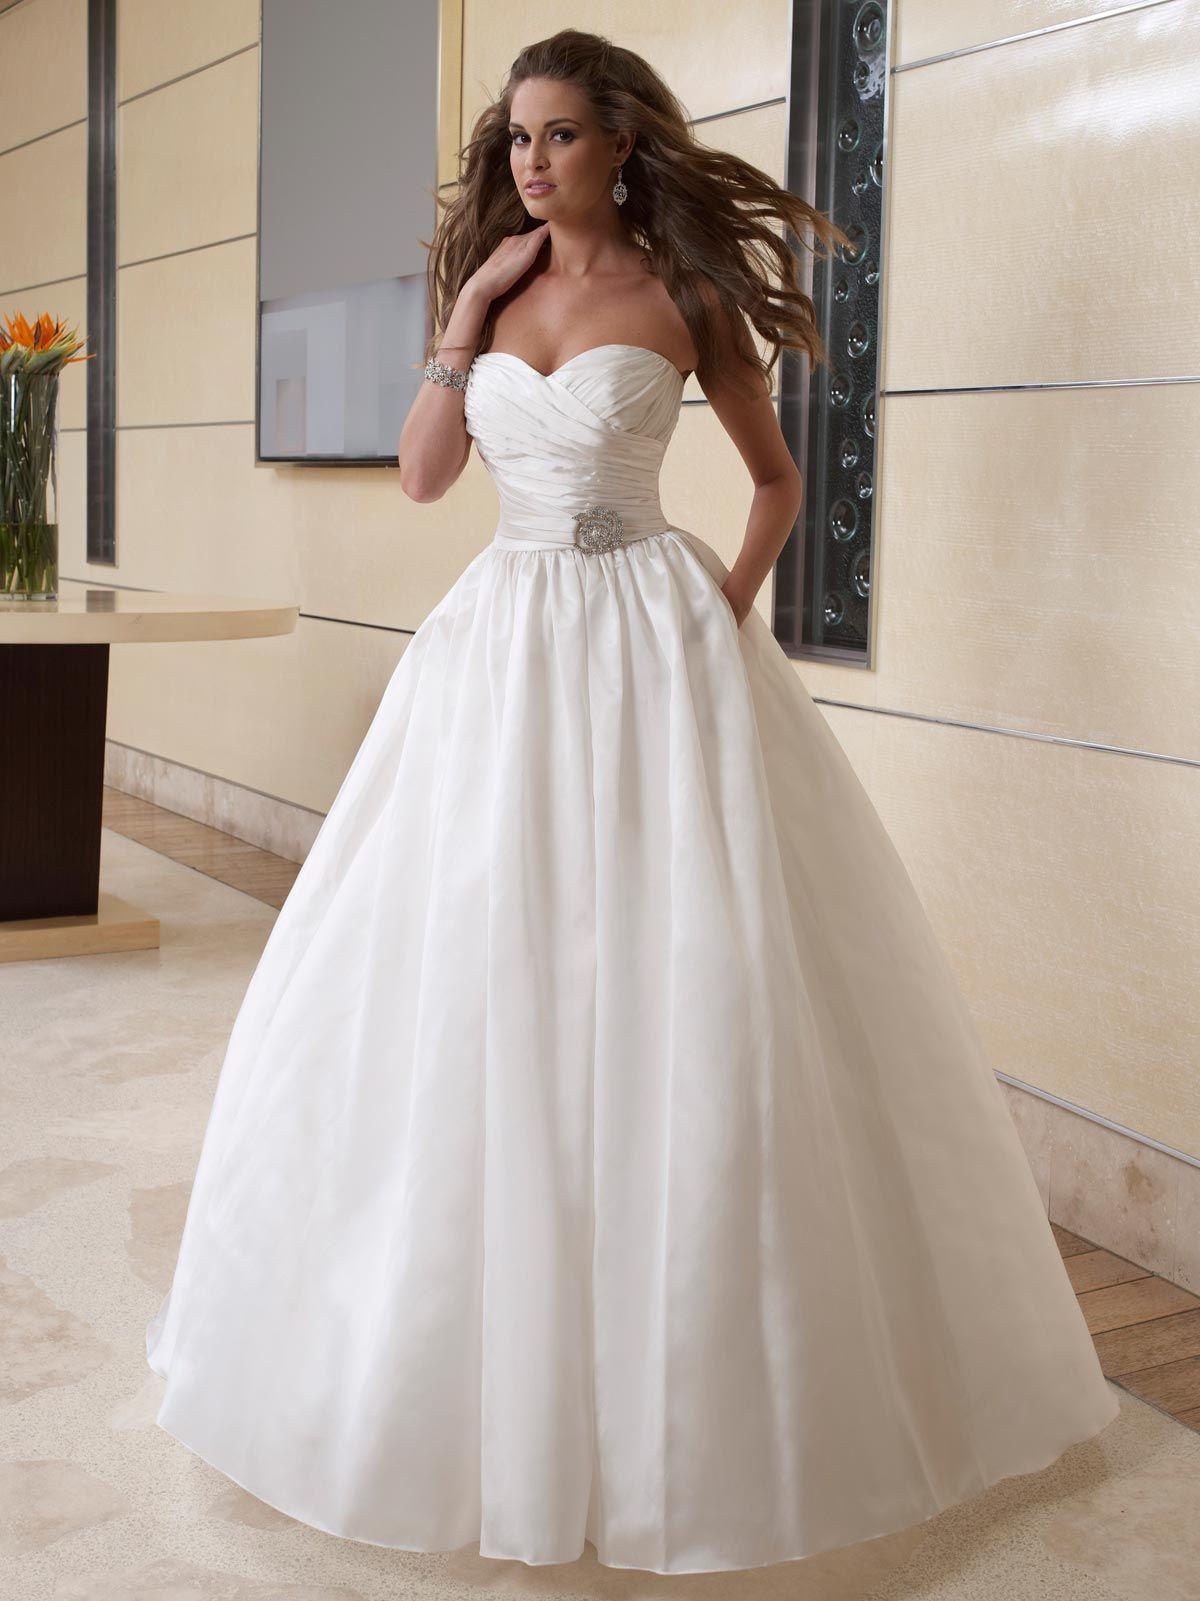 Introducing Rewritten Chic Sophisticated Designs For Modern Bridesmaids Modern Bridesmaid Dresses Bridesmaid Dresses Gorgeous Bridesmaid Dresses [ 1333 x 2000 Pixel ]